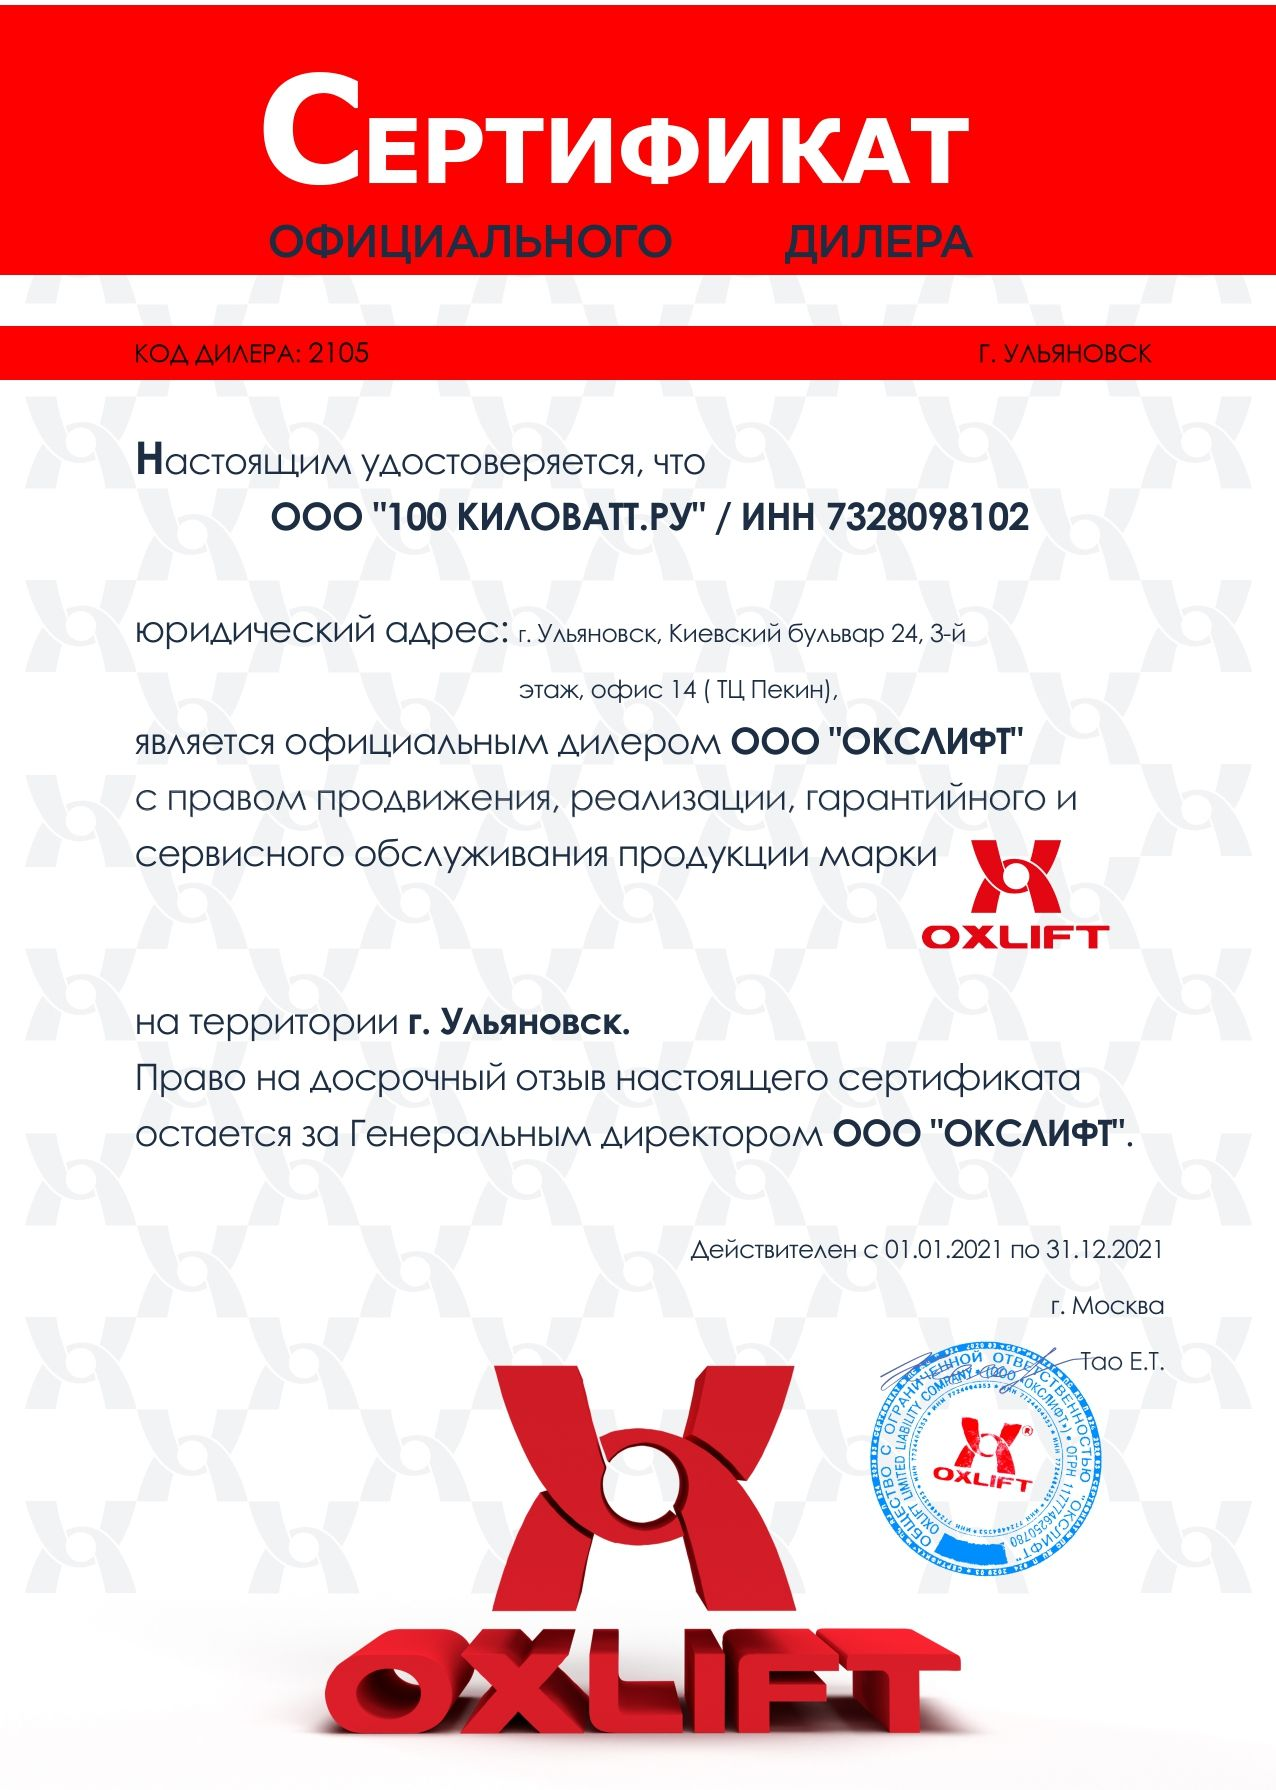 OXLIFT - Сертификат дилера